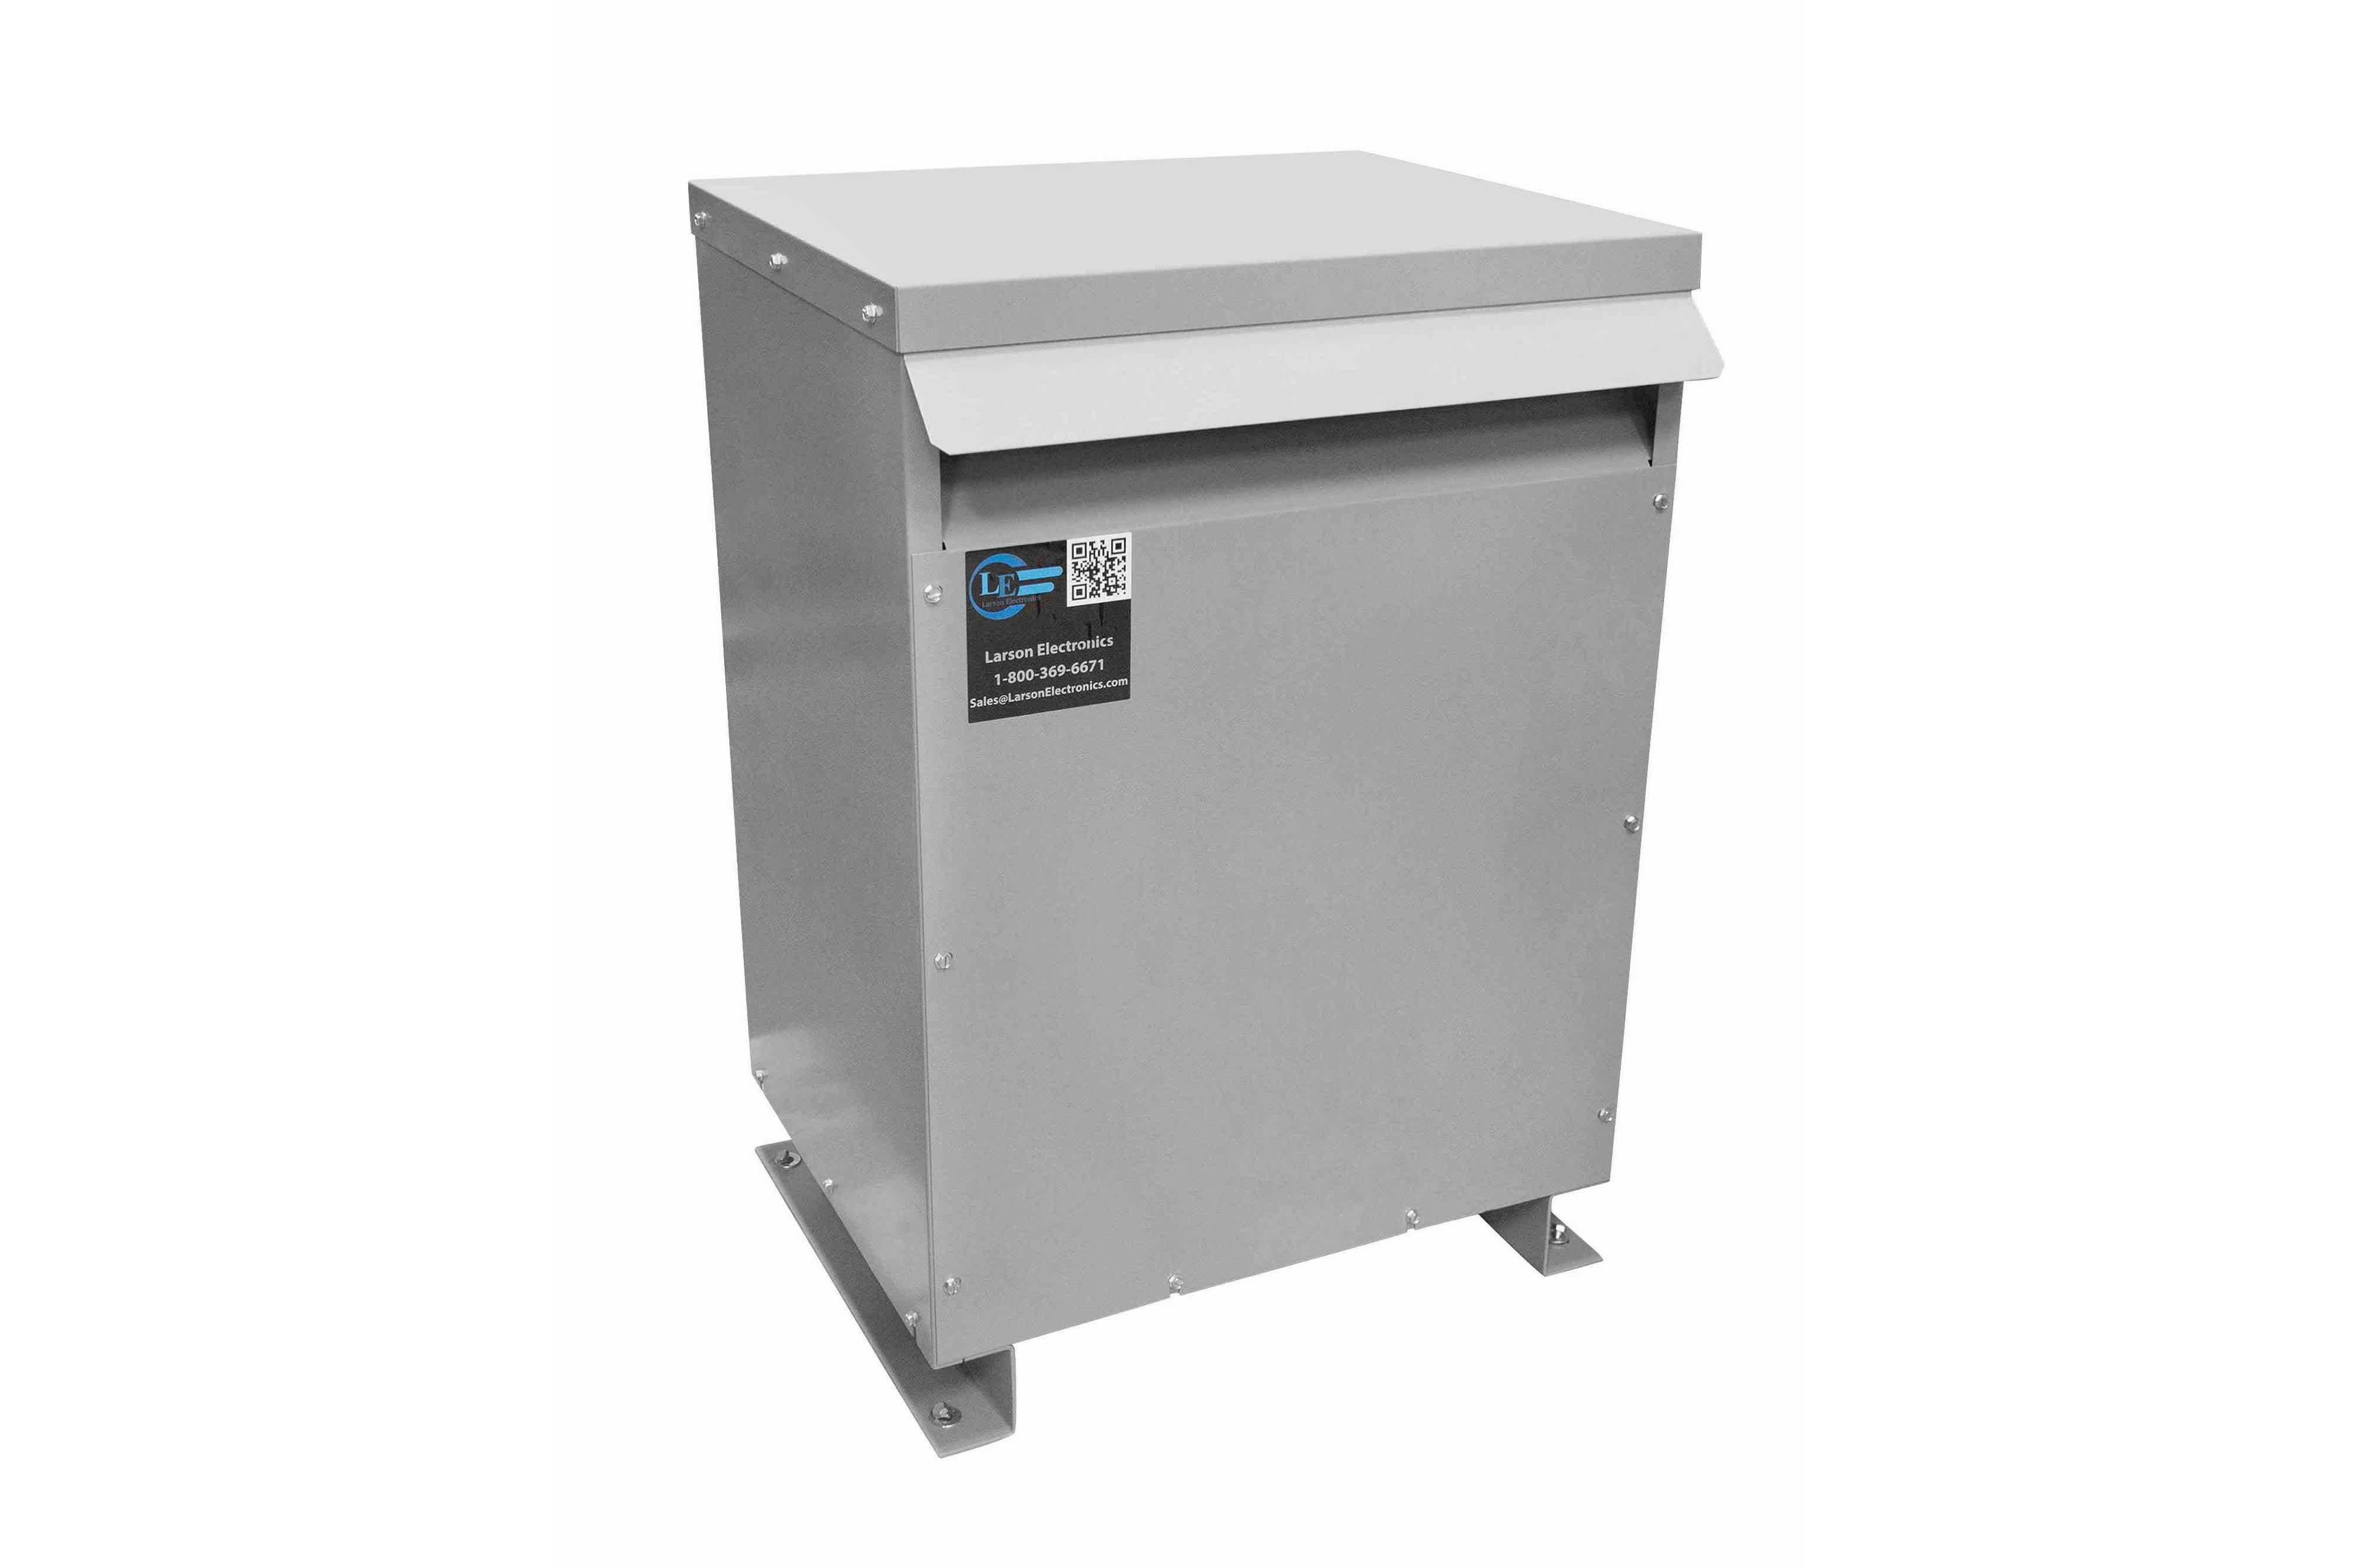 75 kVA 3PH Isolation Transformer, 415V Wye Primary, 600V Delta Secondary, N3R, Ventilated, 60 Hz